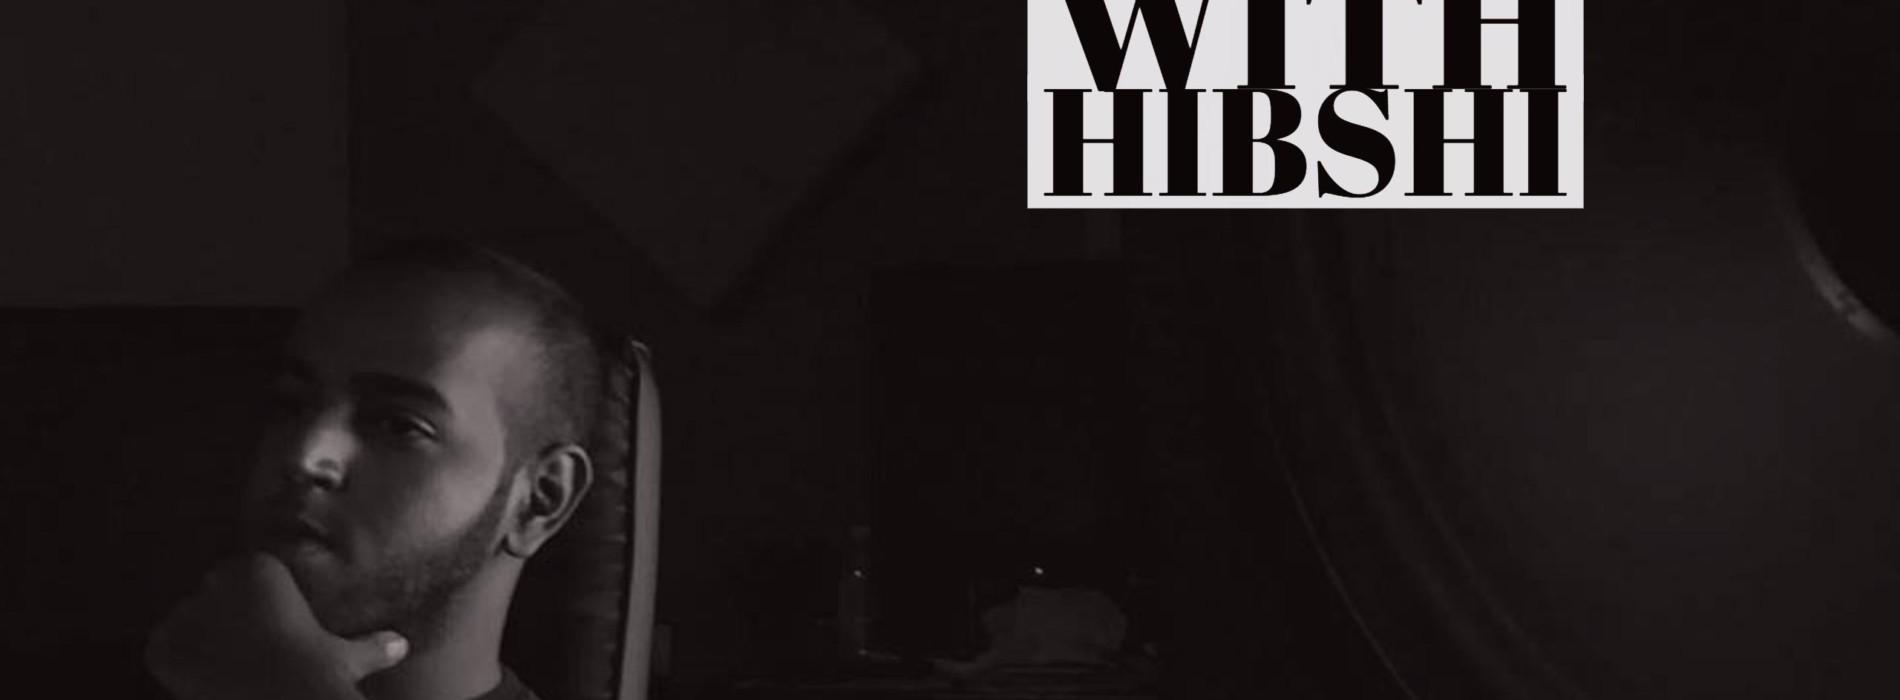 Decibel Exclusive : Hibshi On 'Cold Beer', AiMEE & More